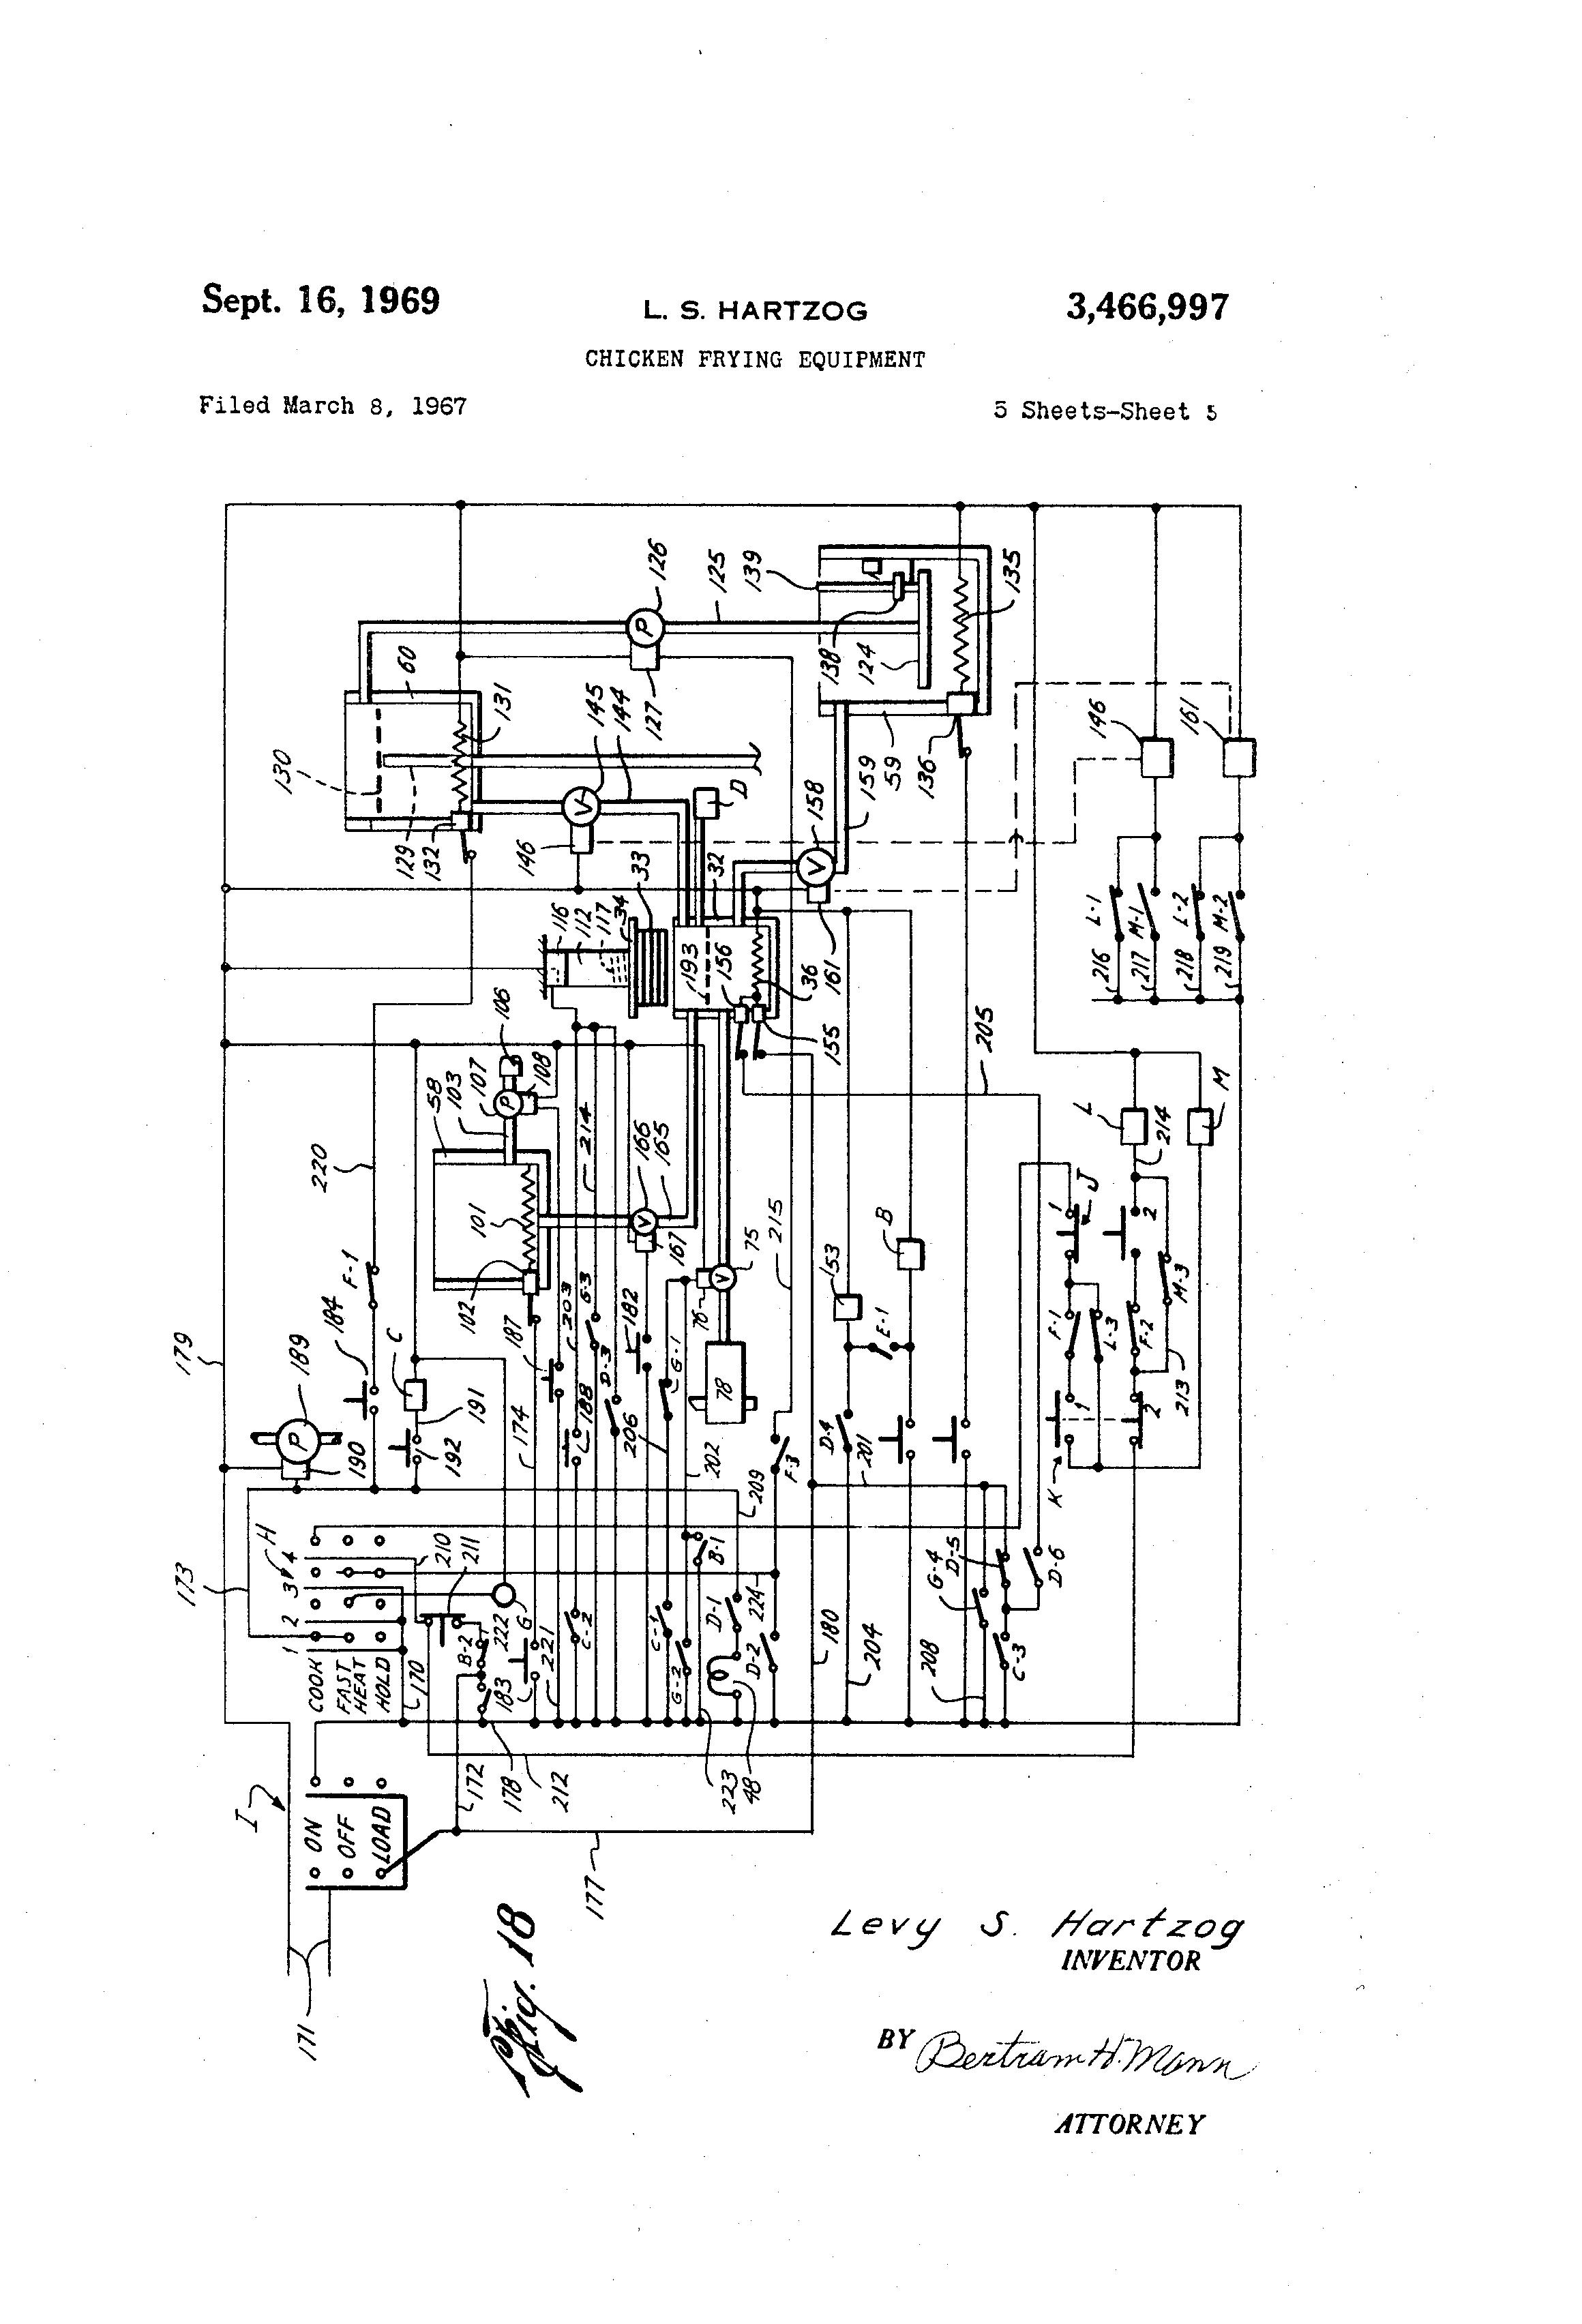 patent us3466997 - chicken frying equipment